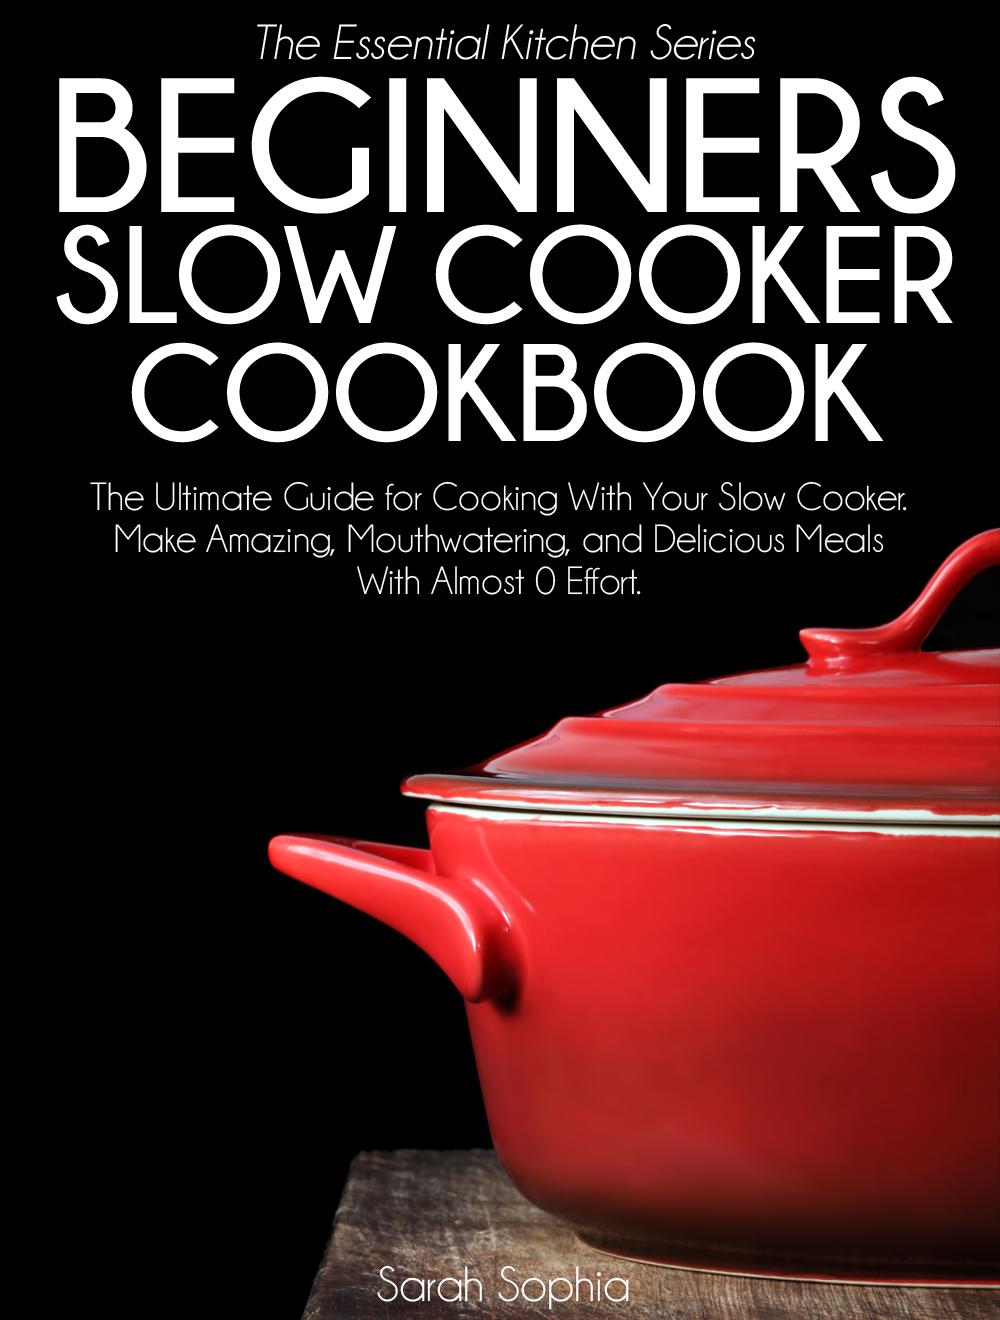 Slow cooker cookbook for beginners